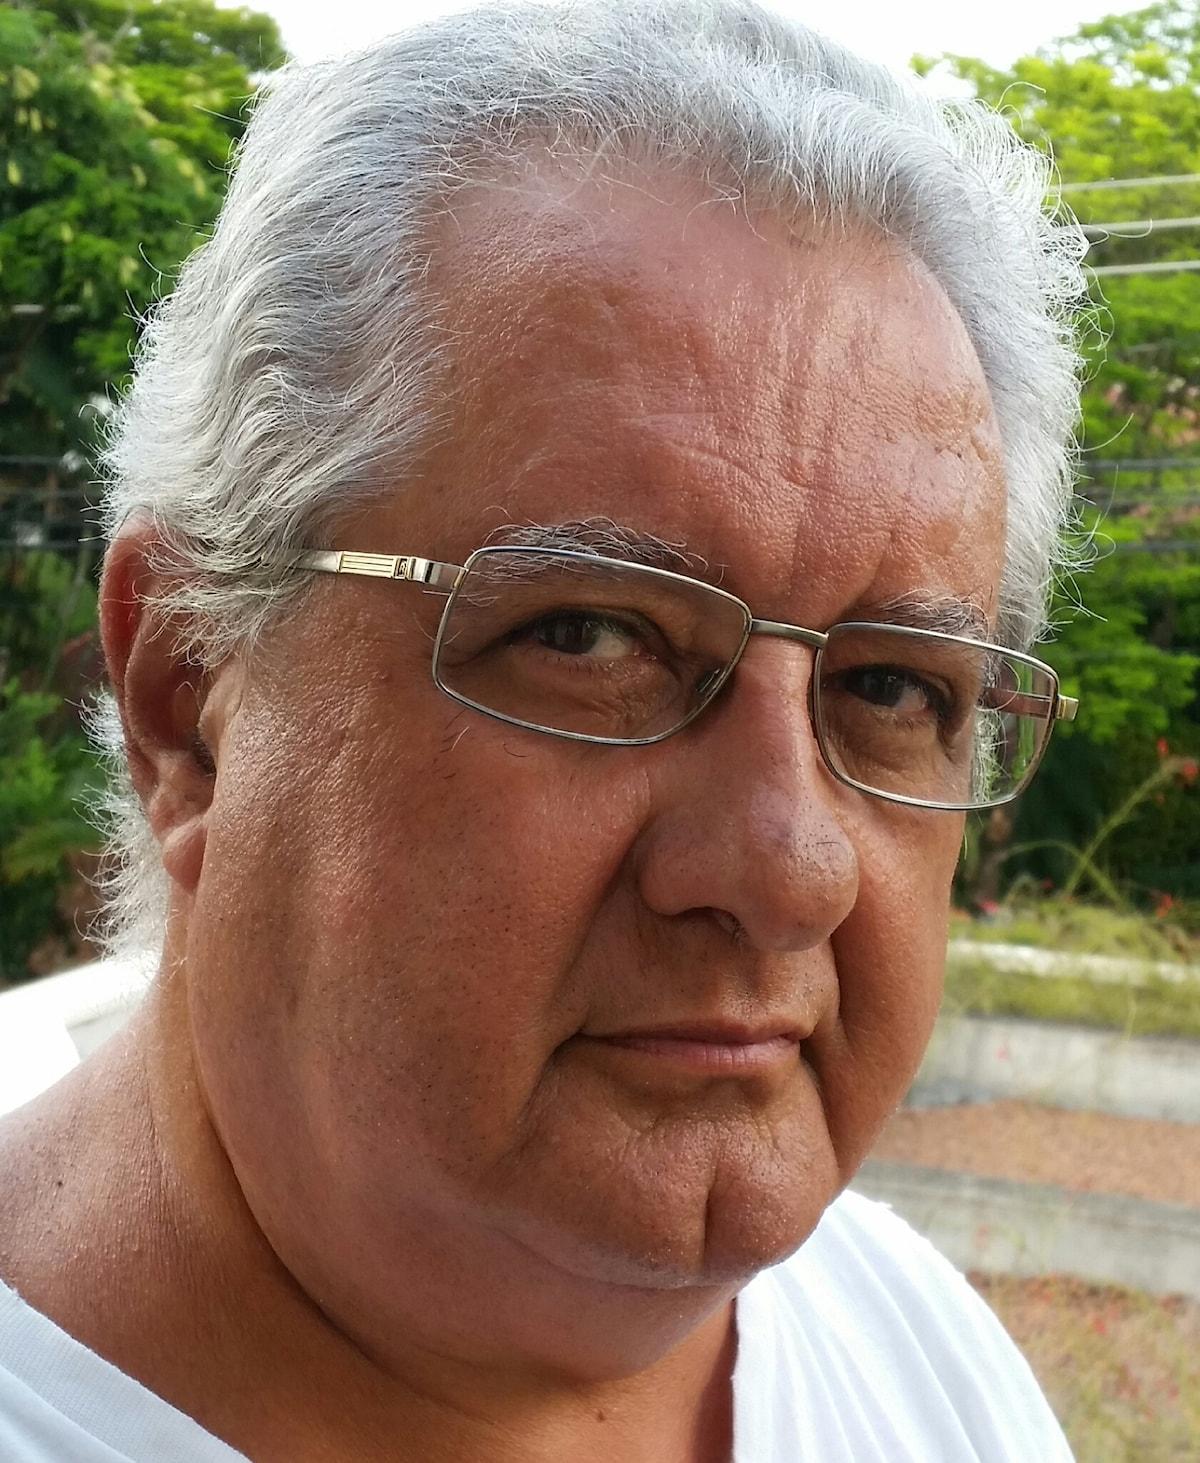 Renato From Santana de Parnaíba, Brazil